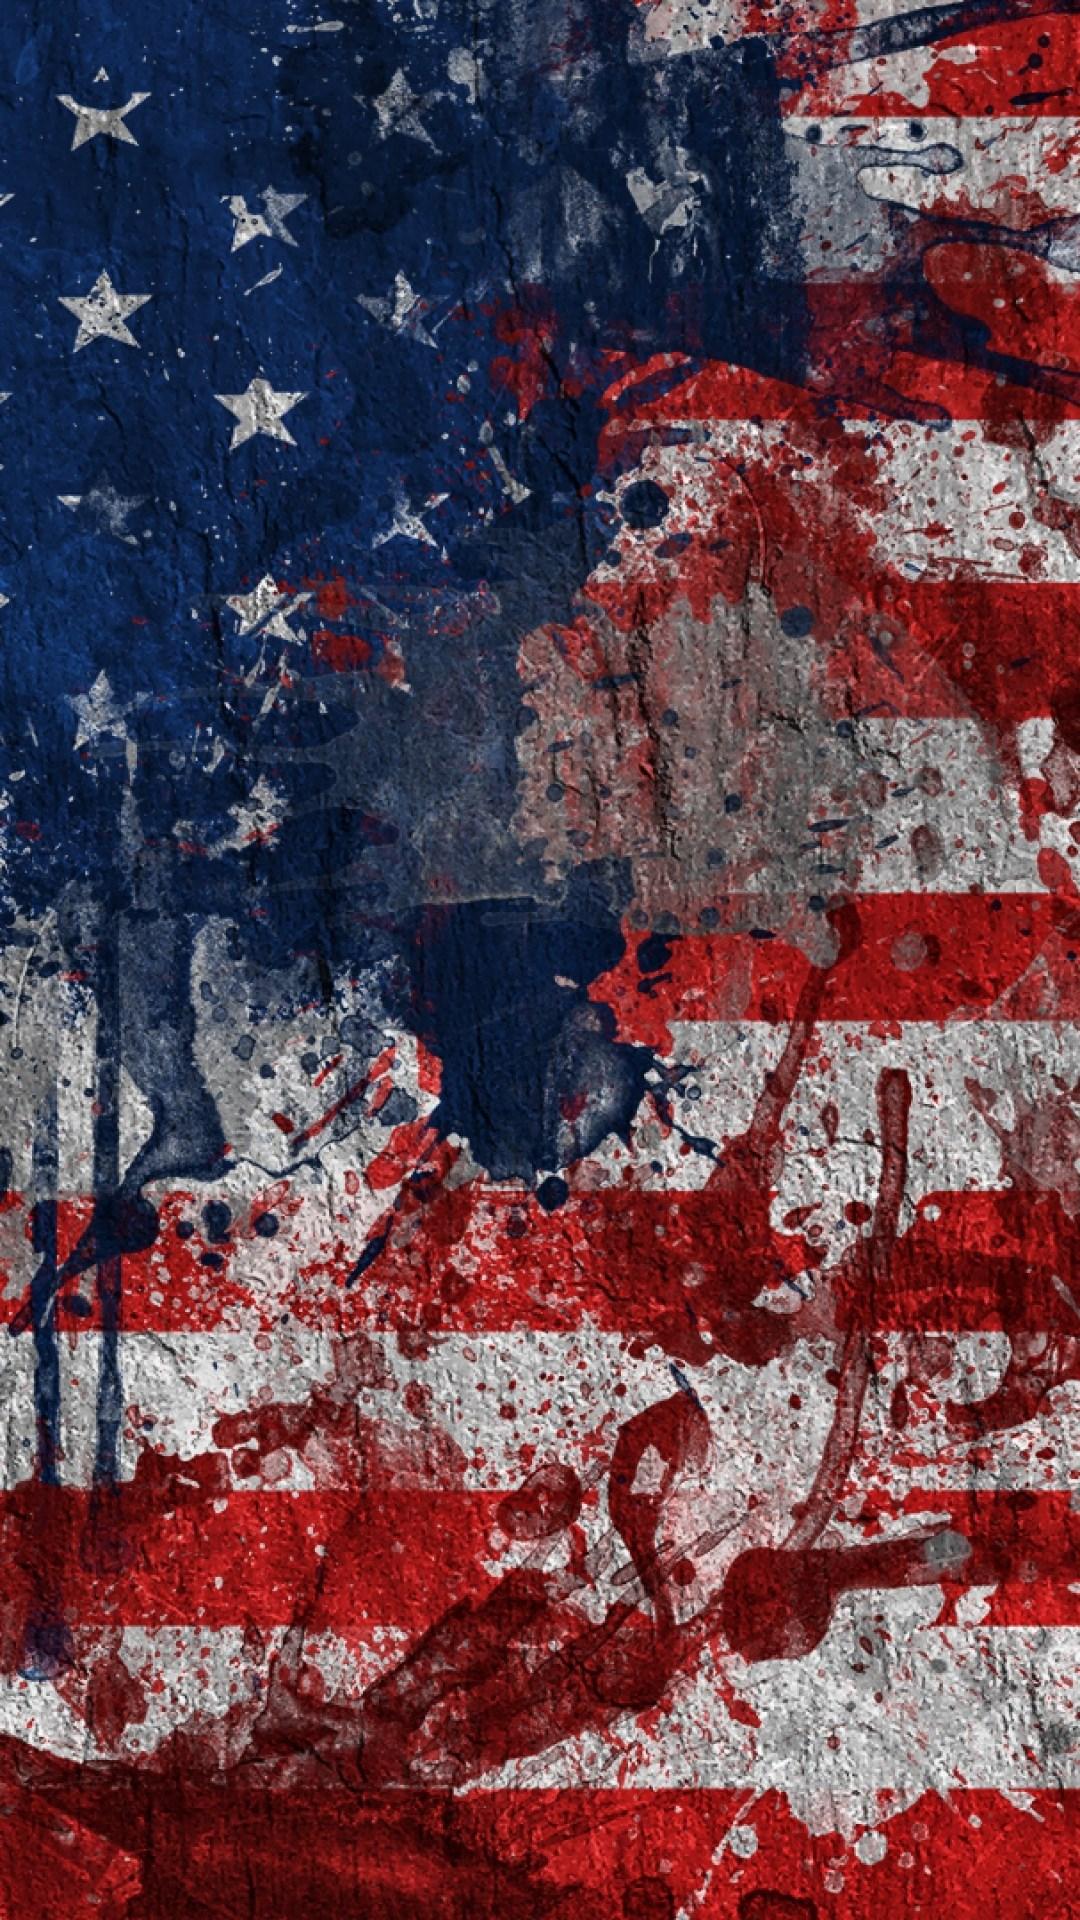 Cute Wallpaper For Mobile Hd Free Download American Flag Hd Iphone Wallpapers Pixelstalk Net